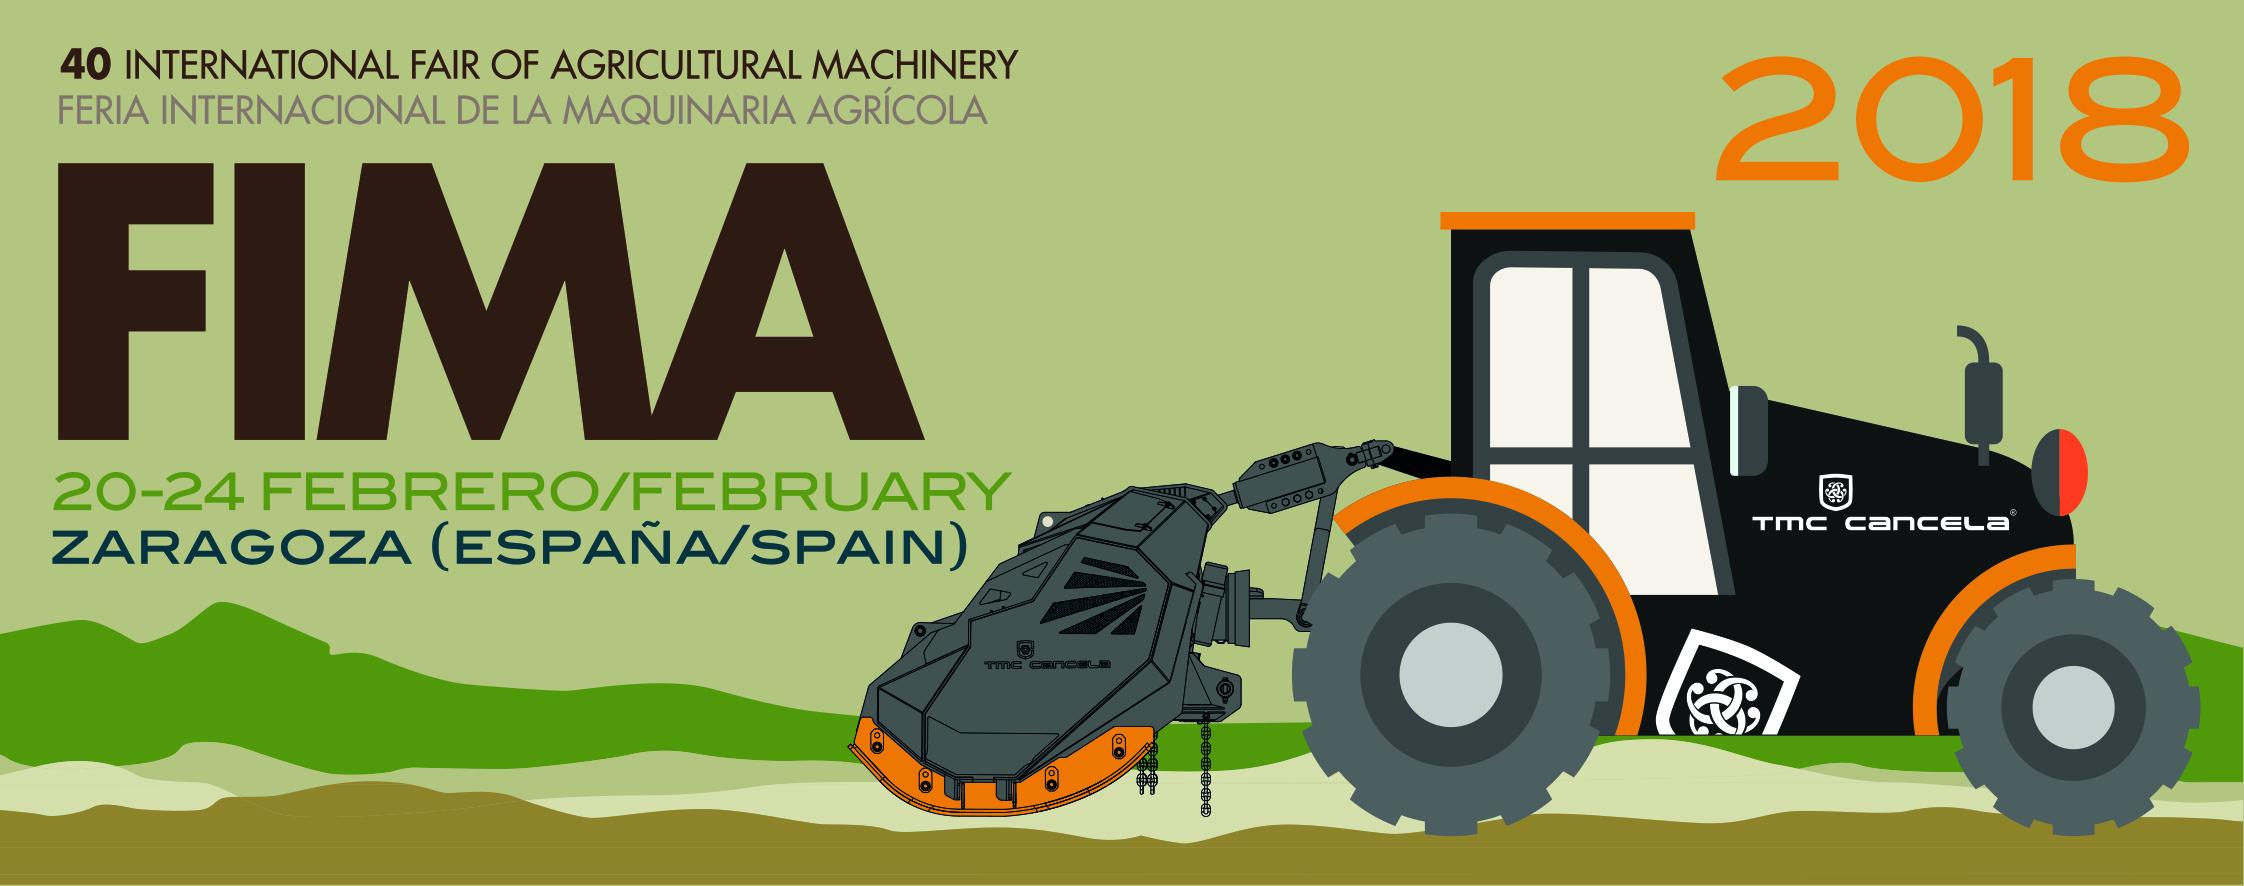 FIMA 2018 Zaragoza (Spain)